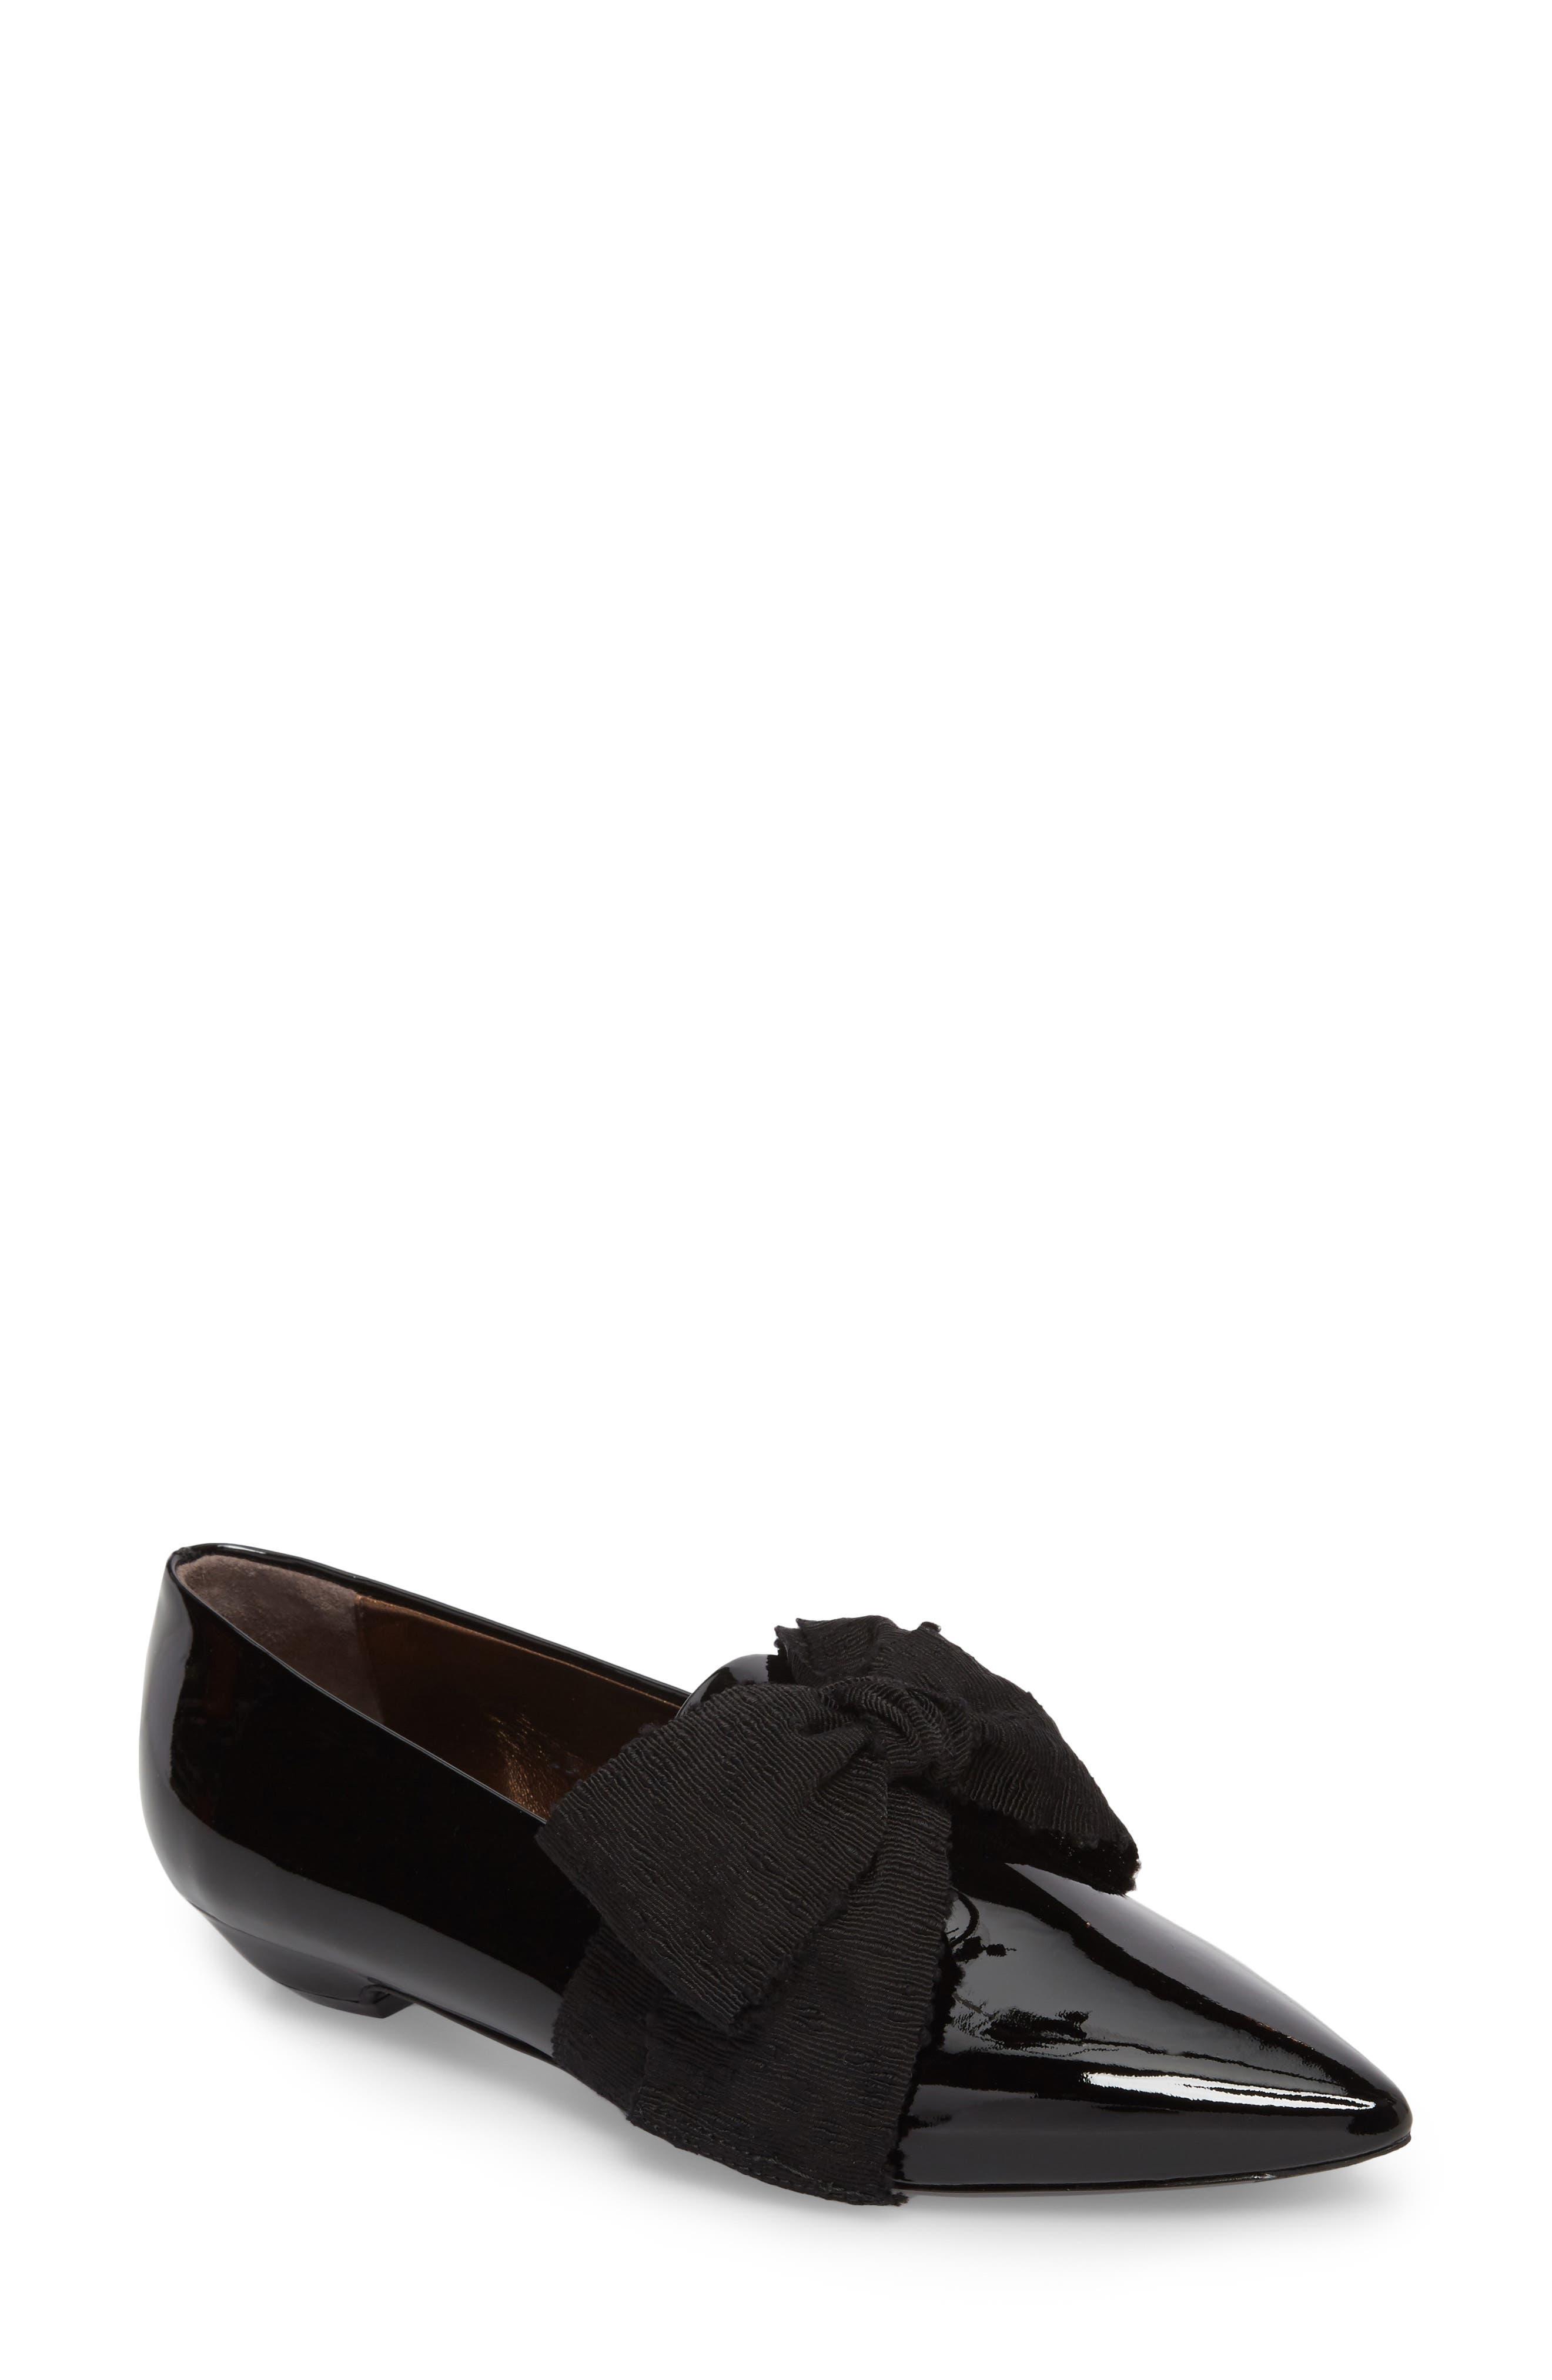 AGL ATTILIO GIUSTI LEOMBRUNI Bow embellished loafers